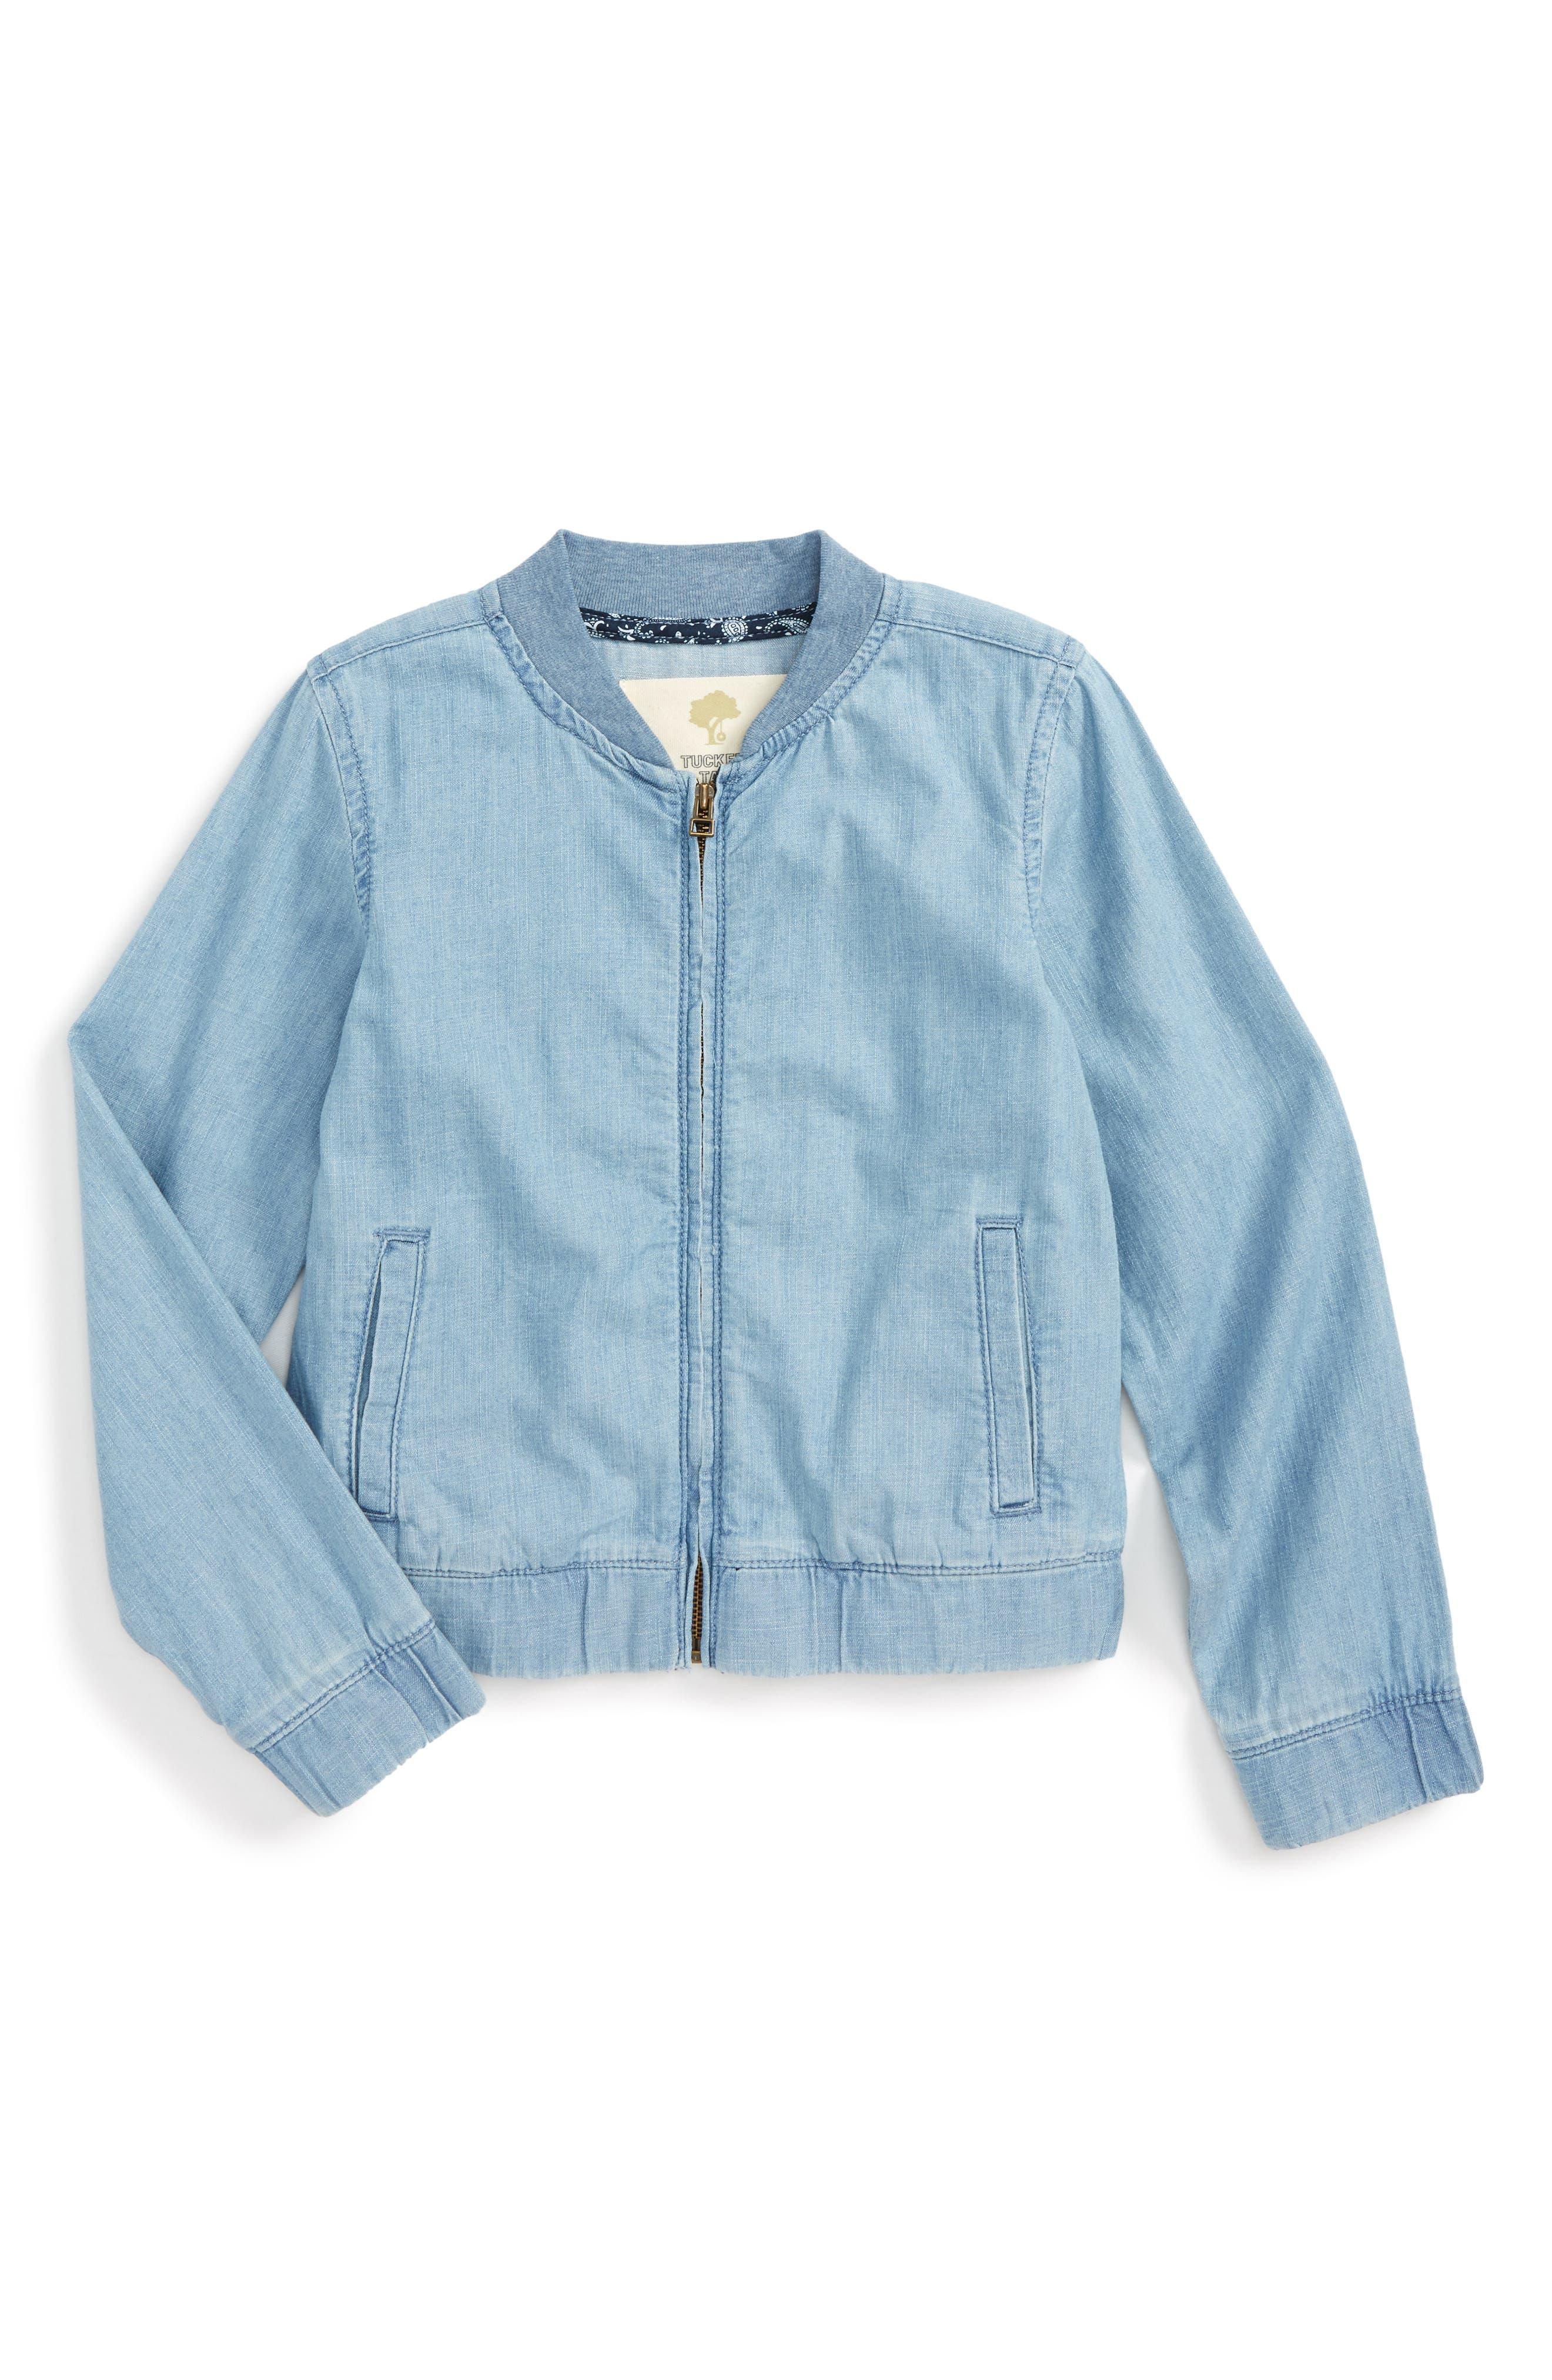 Denim Bomber Jacket,                             Main thumbnail 1, color,                             Bluebird Wash